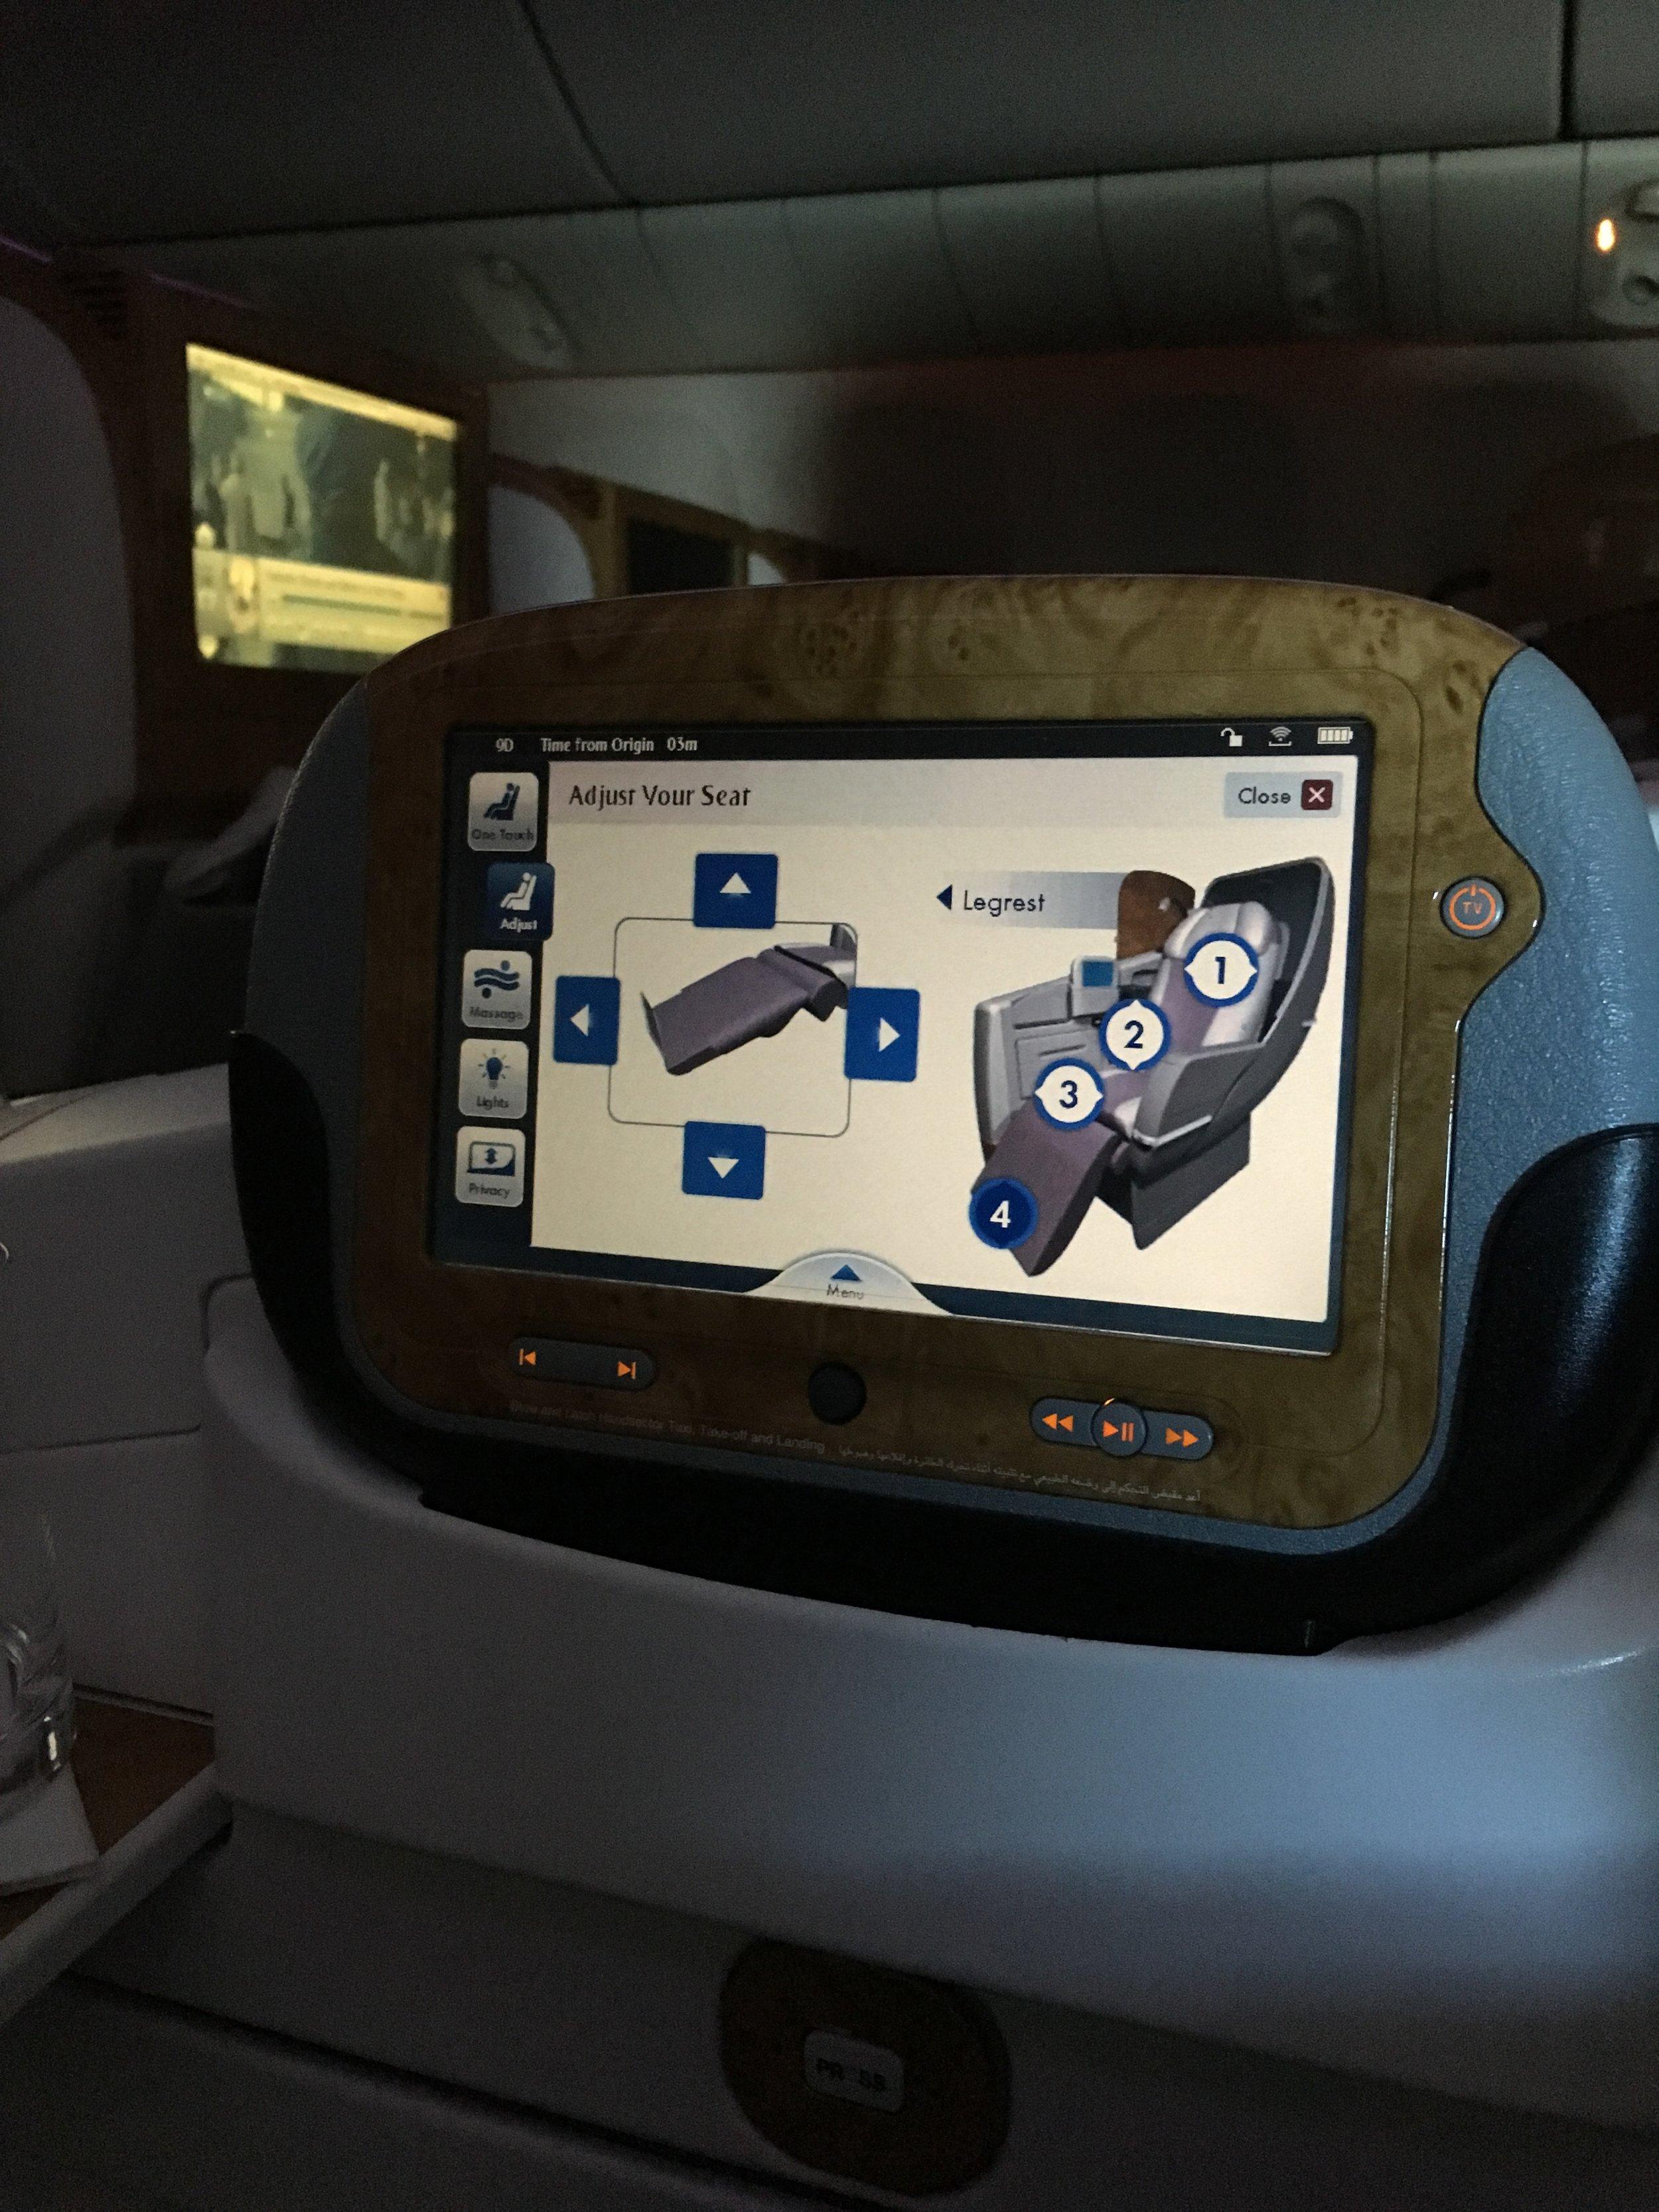 Emirates Business Class Seat Adjustment Options